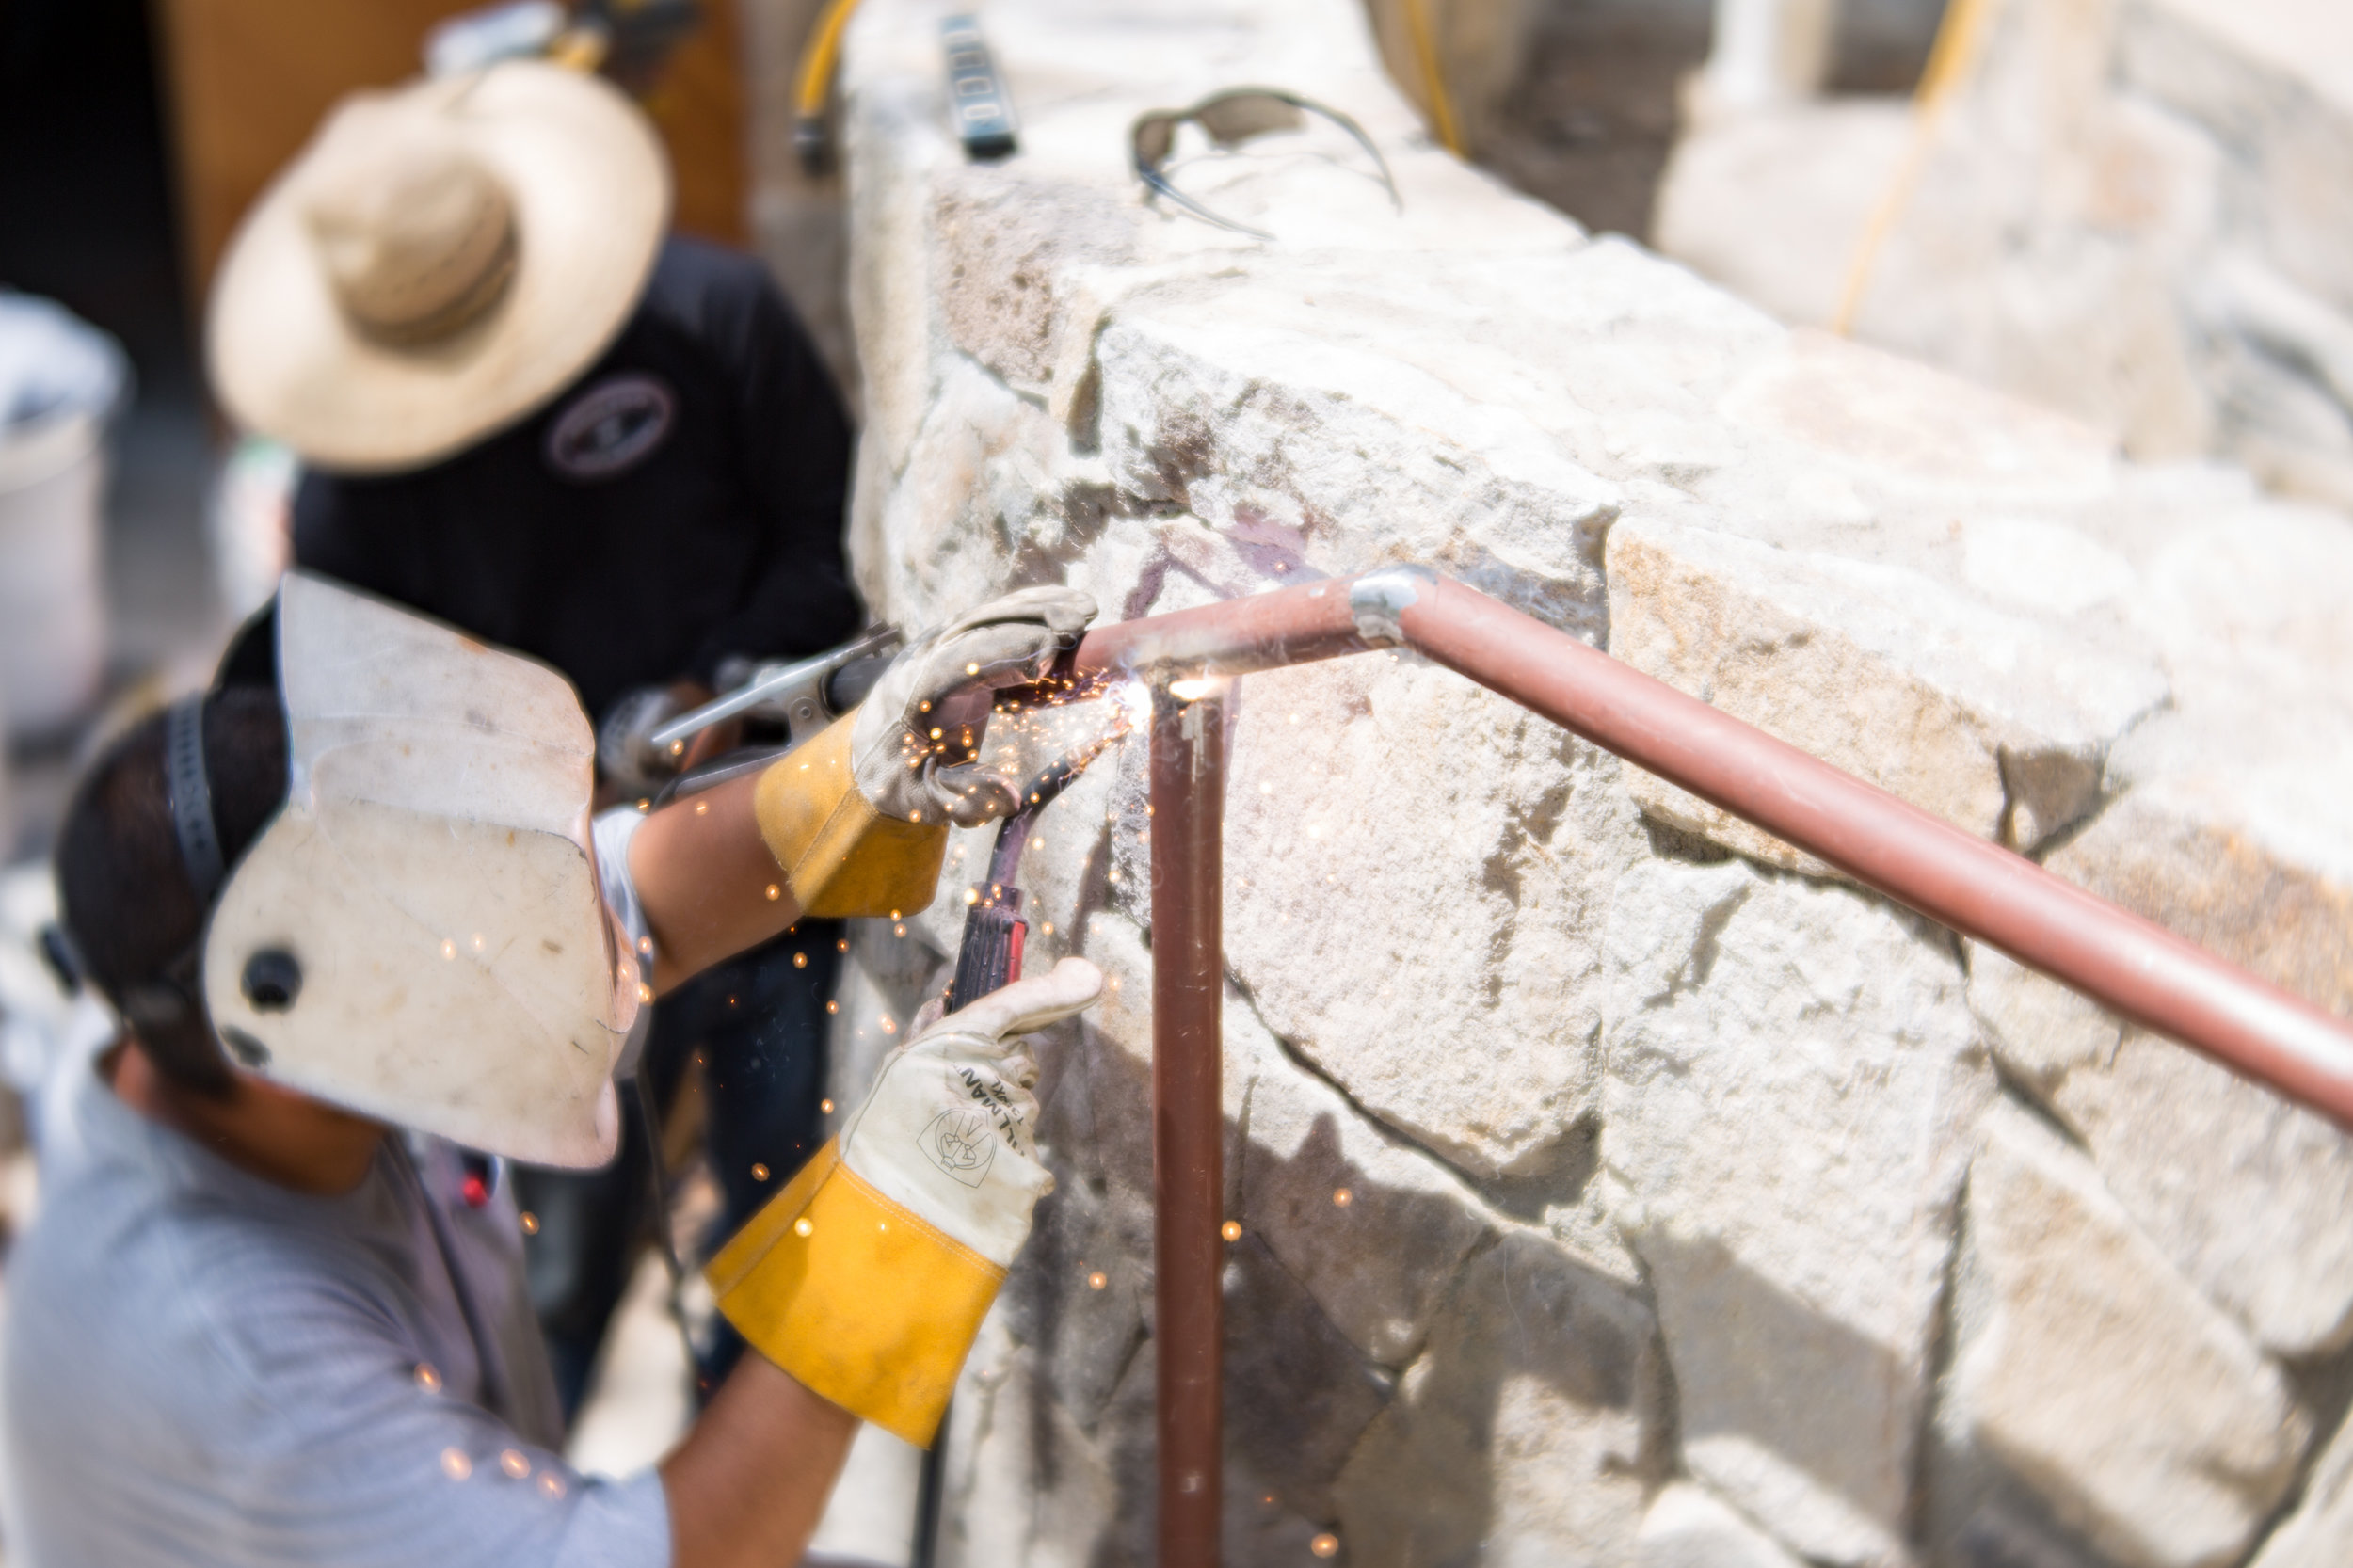 FMA_construction-day4_AI9A8546_lo.jpg